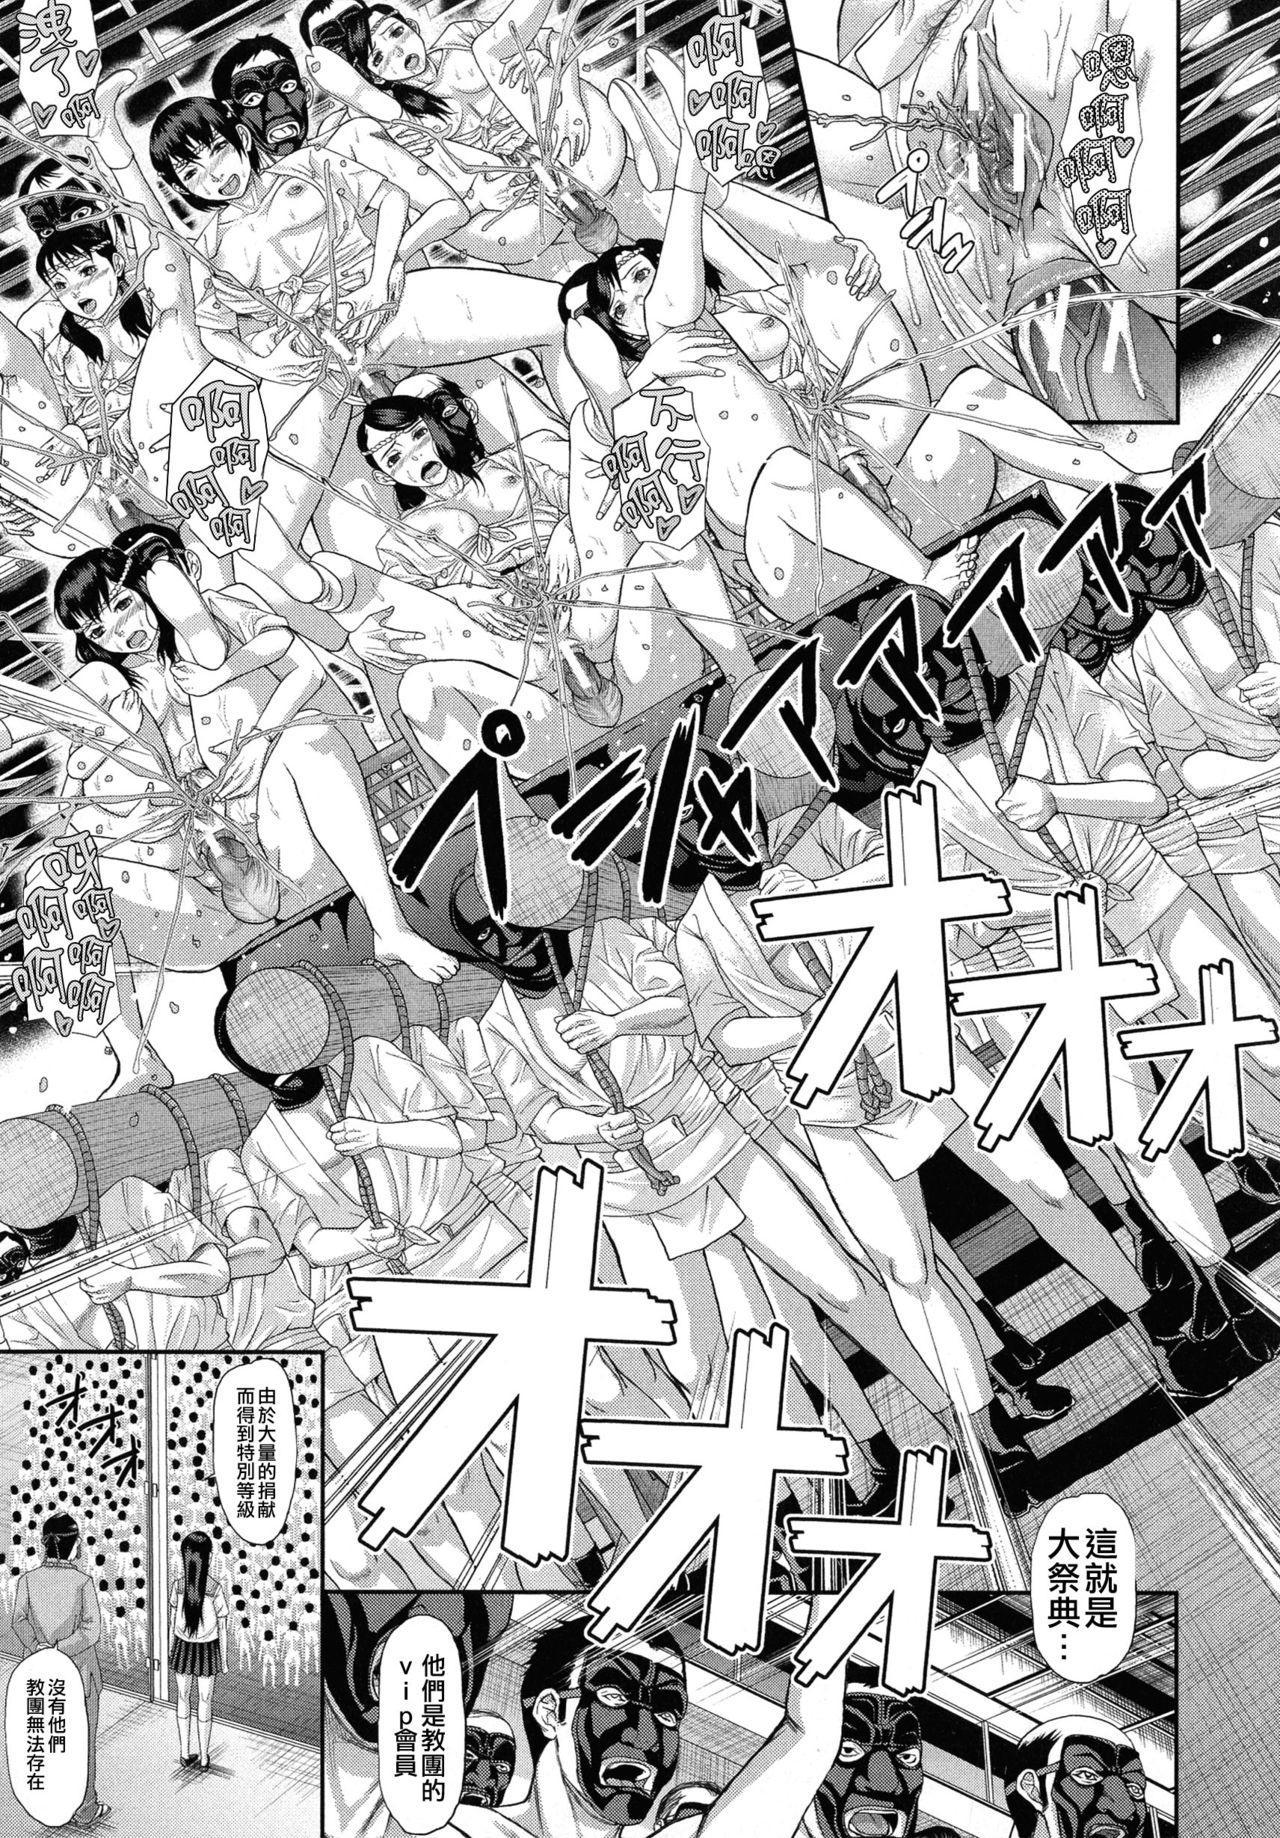 [Honebuto Danshaku] Innou Kaizou Program ~Oyako Zecchou Cult Ochi~ [Chinese]【不想记名重嵌--高质量图源】 181